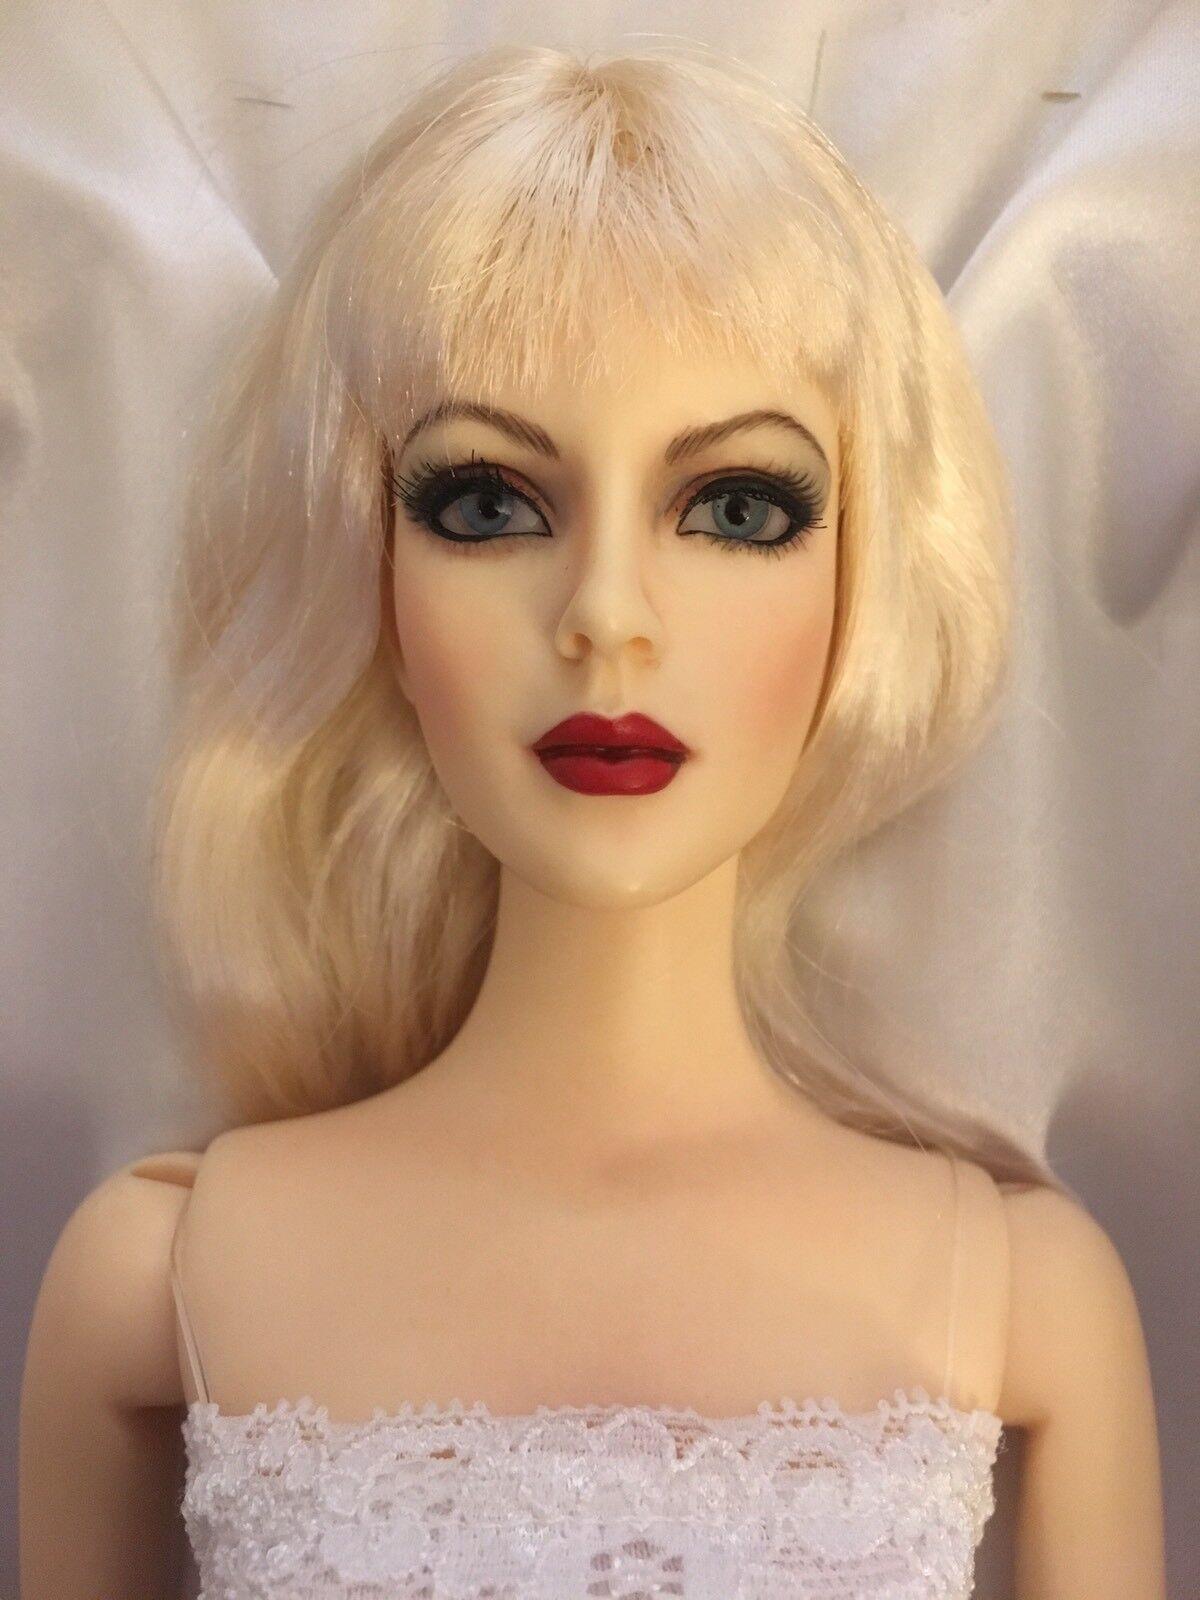 OOAK ULTIMATE TYLER WENTWORTH BASIC16  Tonner Mode BJD Resin Repainted Doll